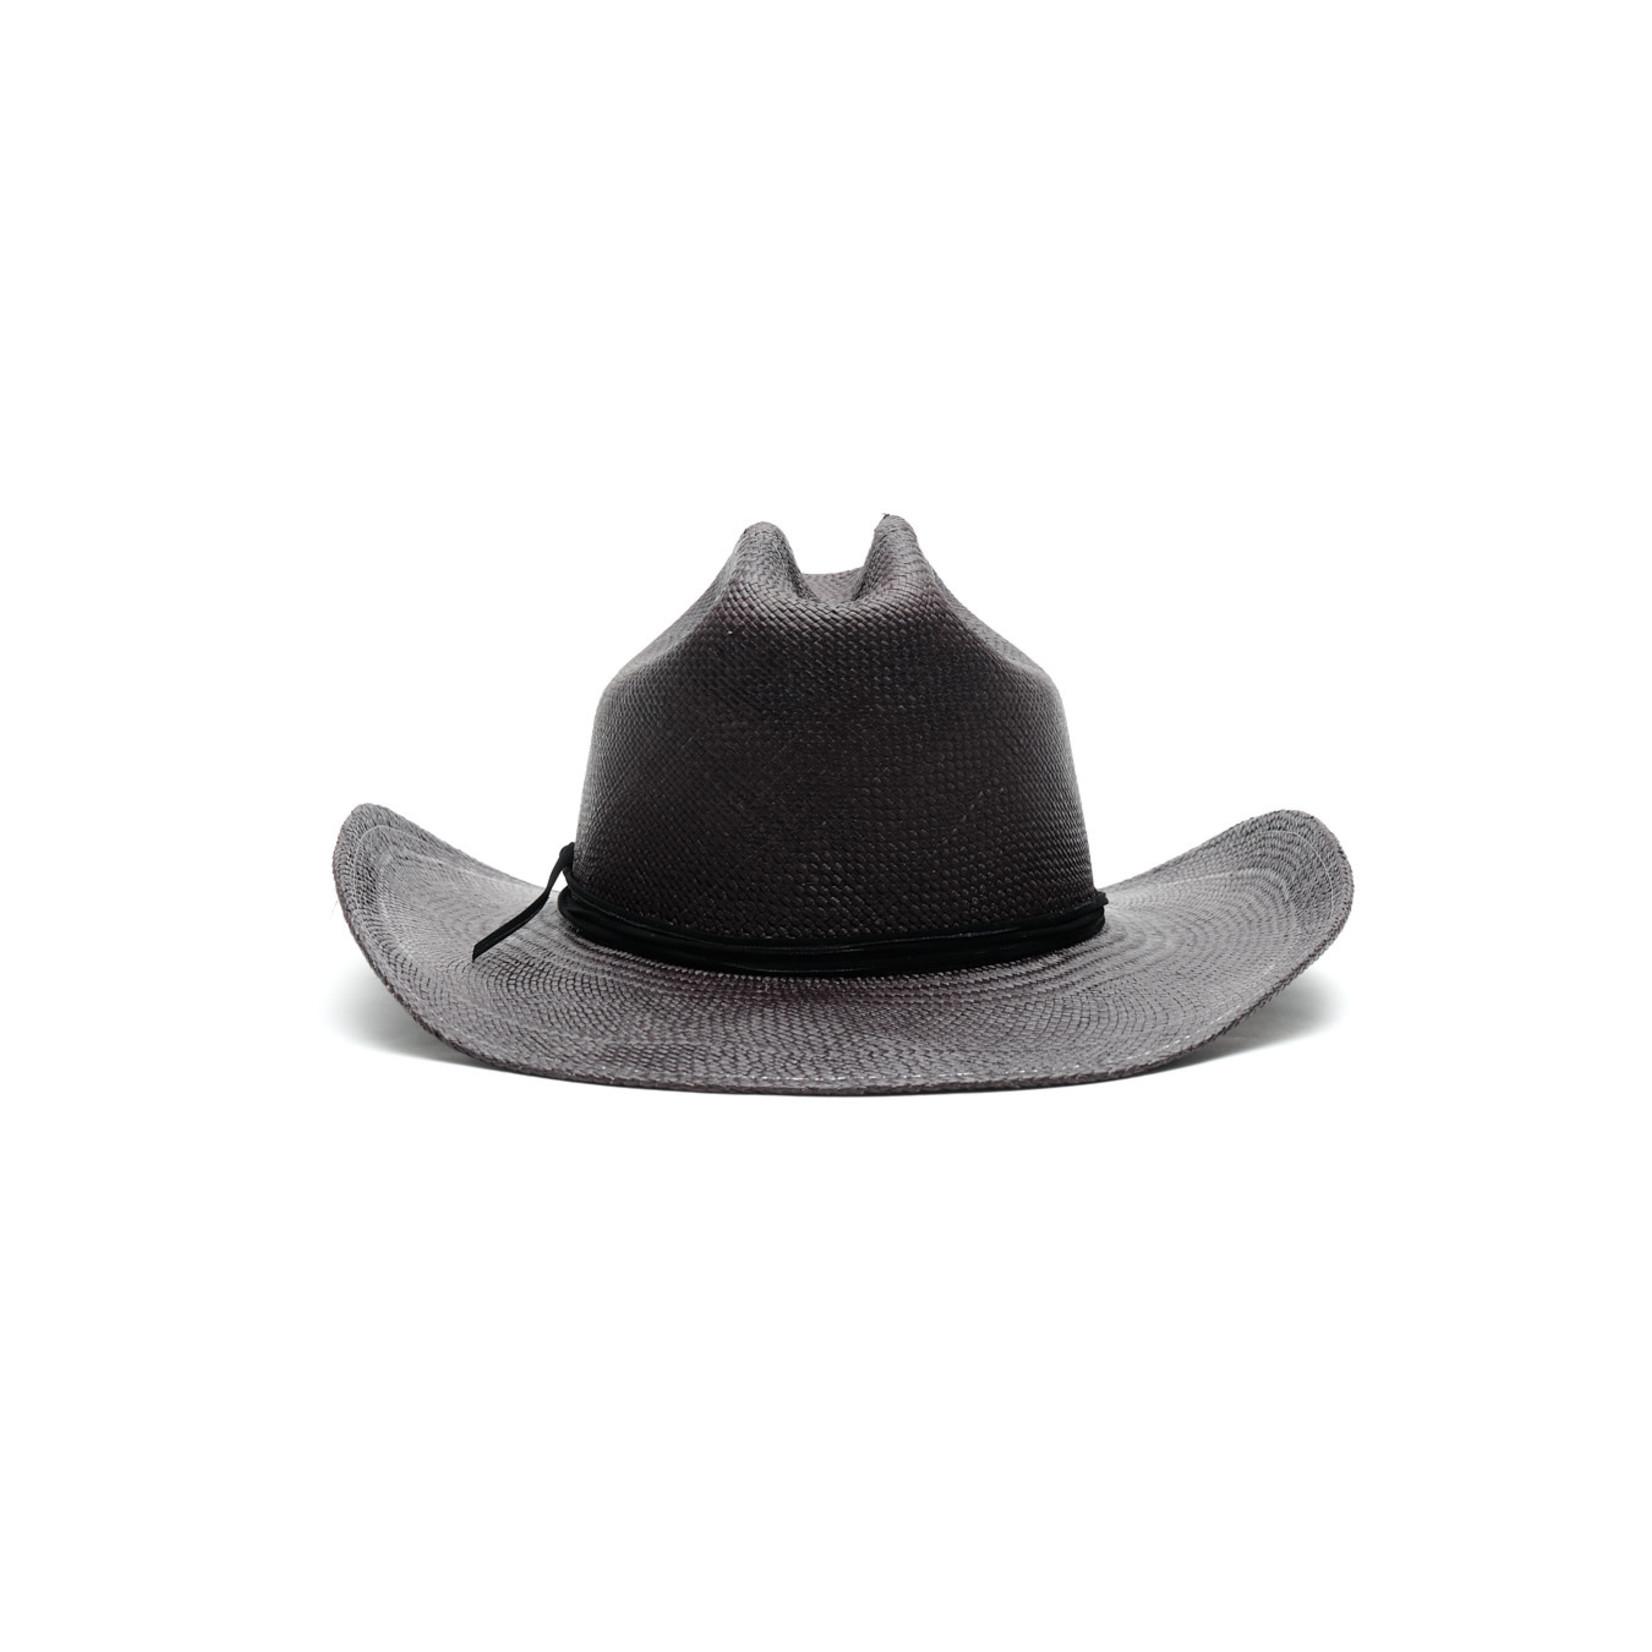 Modern Monarchie Aspen Straw Hat Black